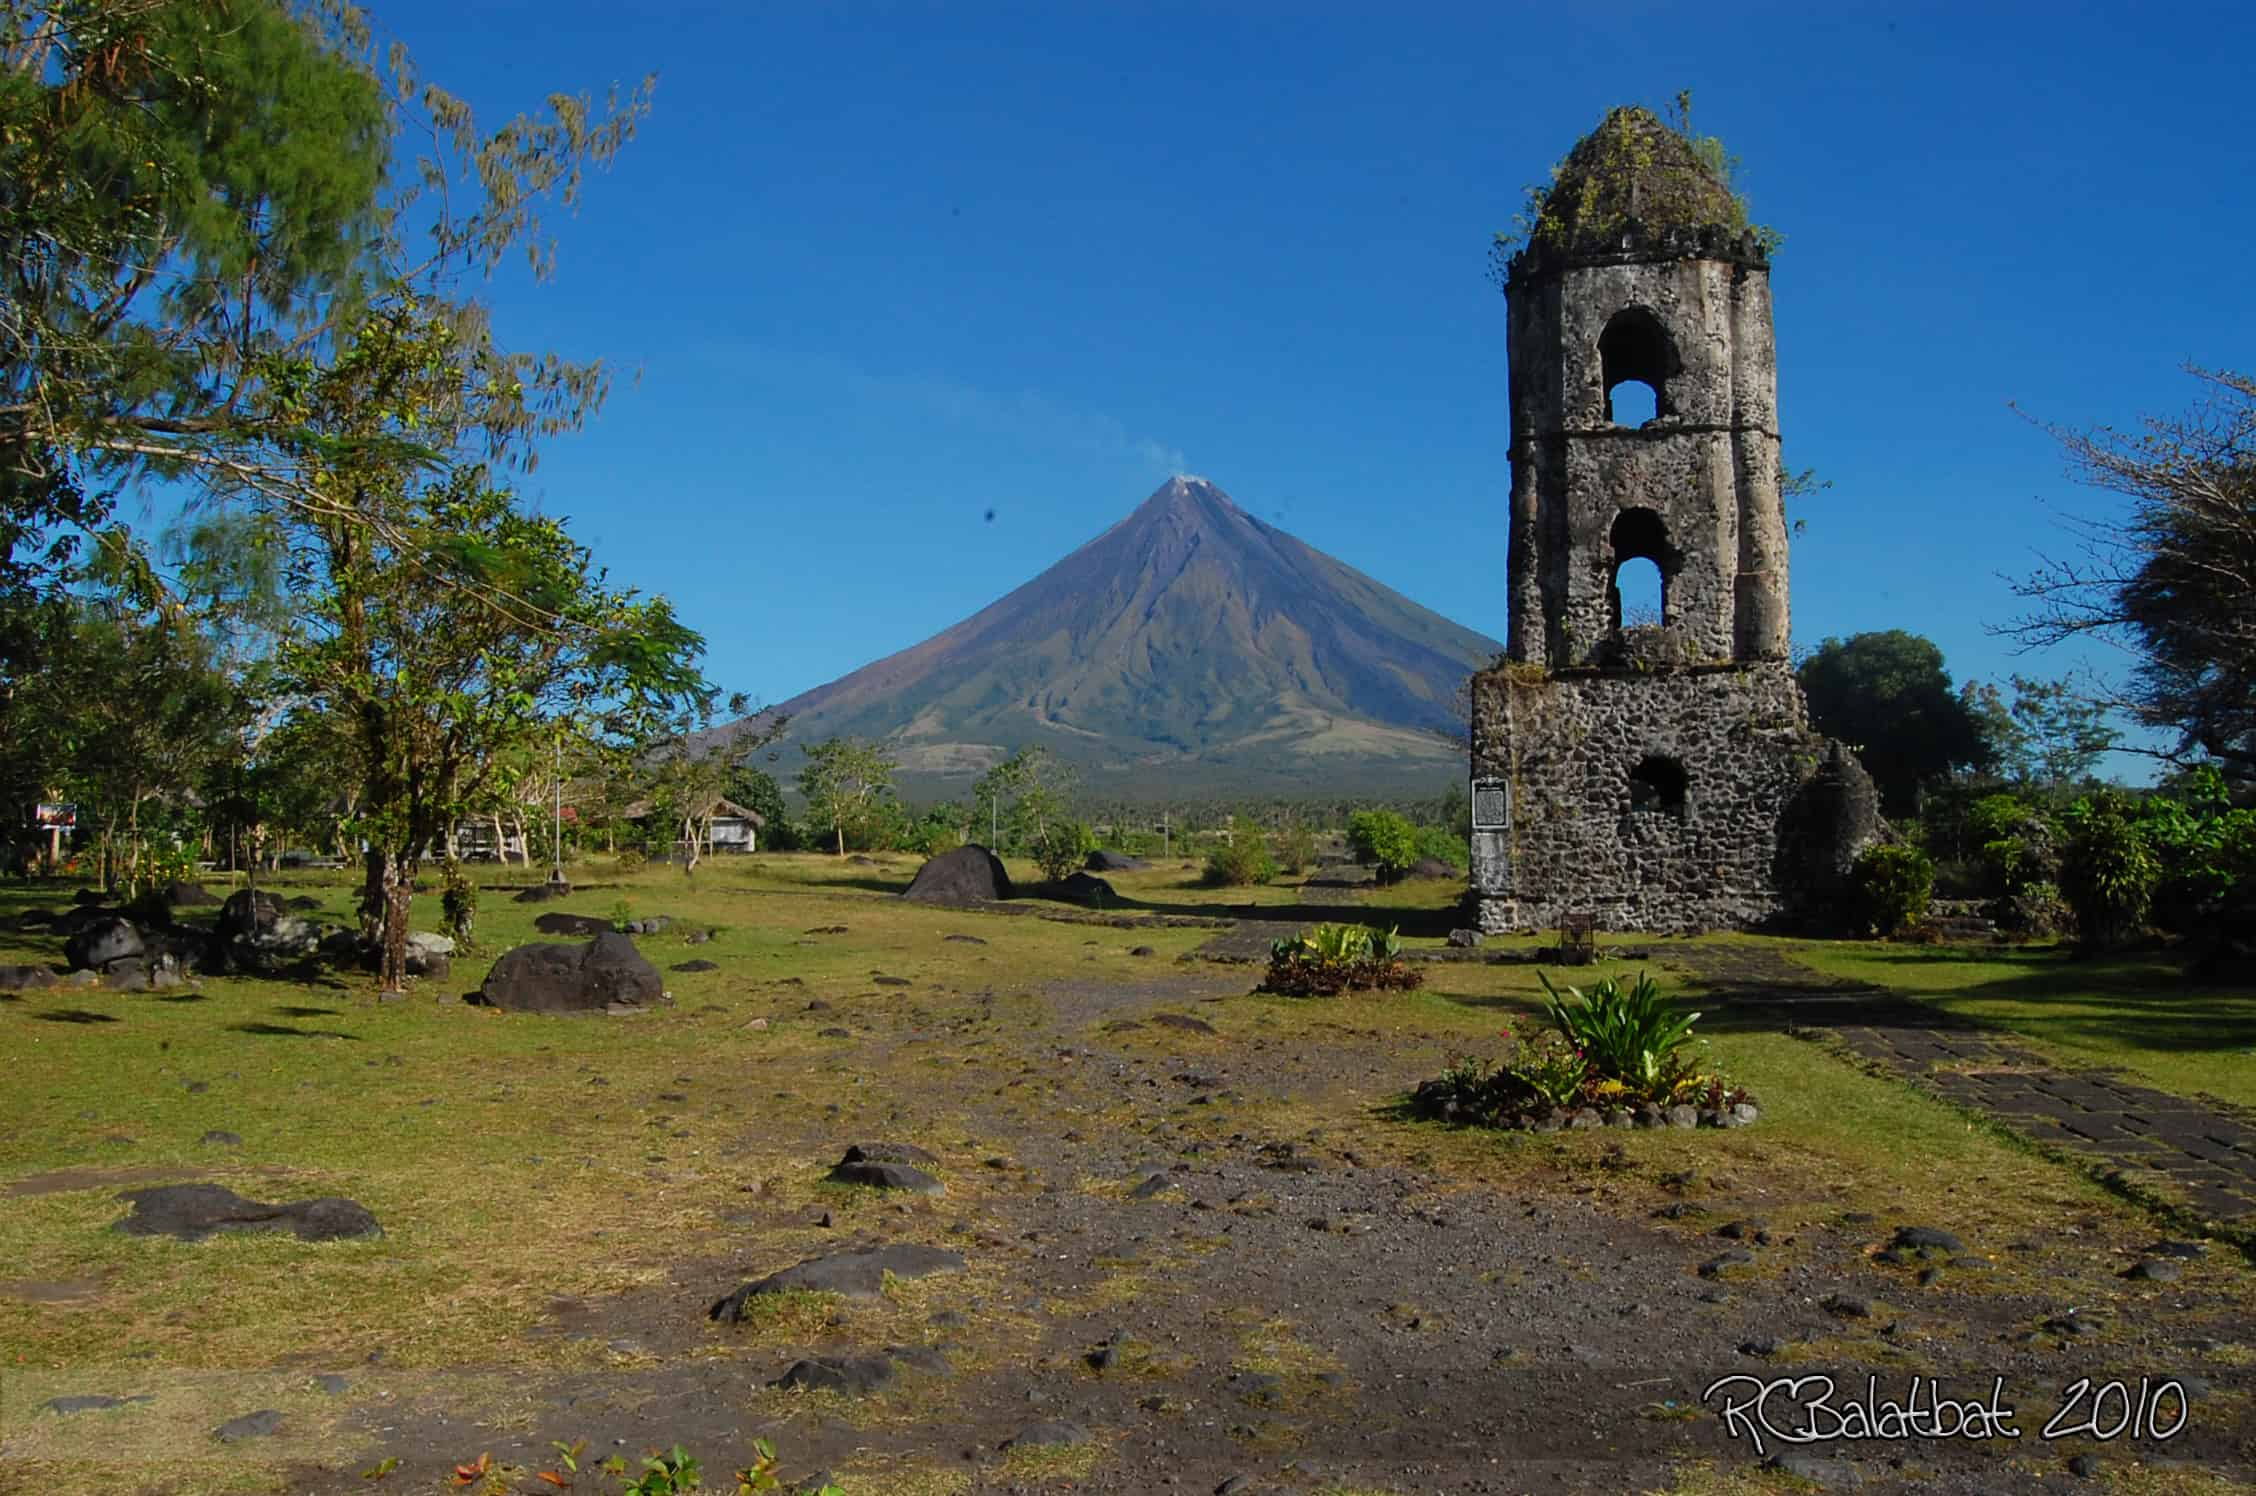 Mt. Mayon, Albay